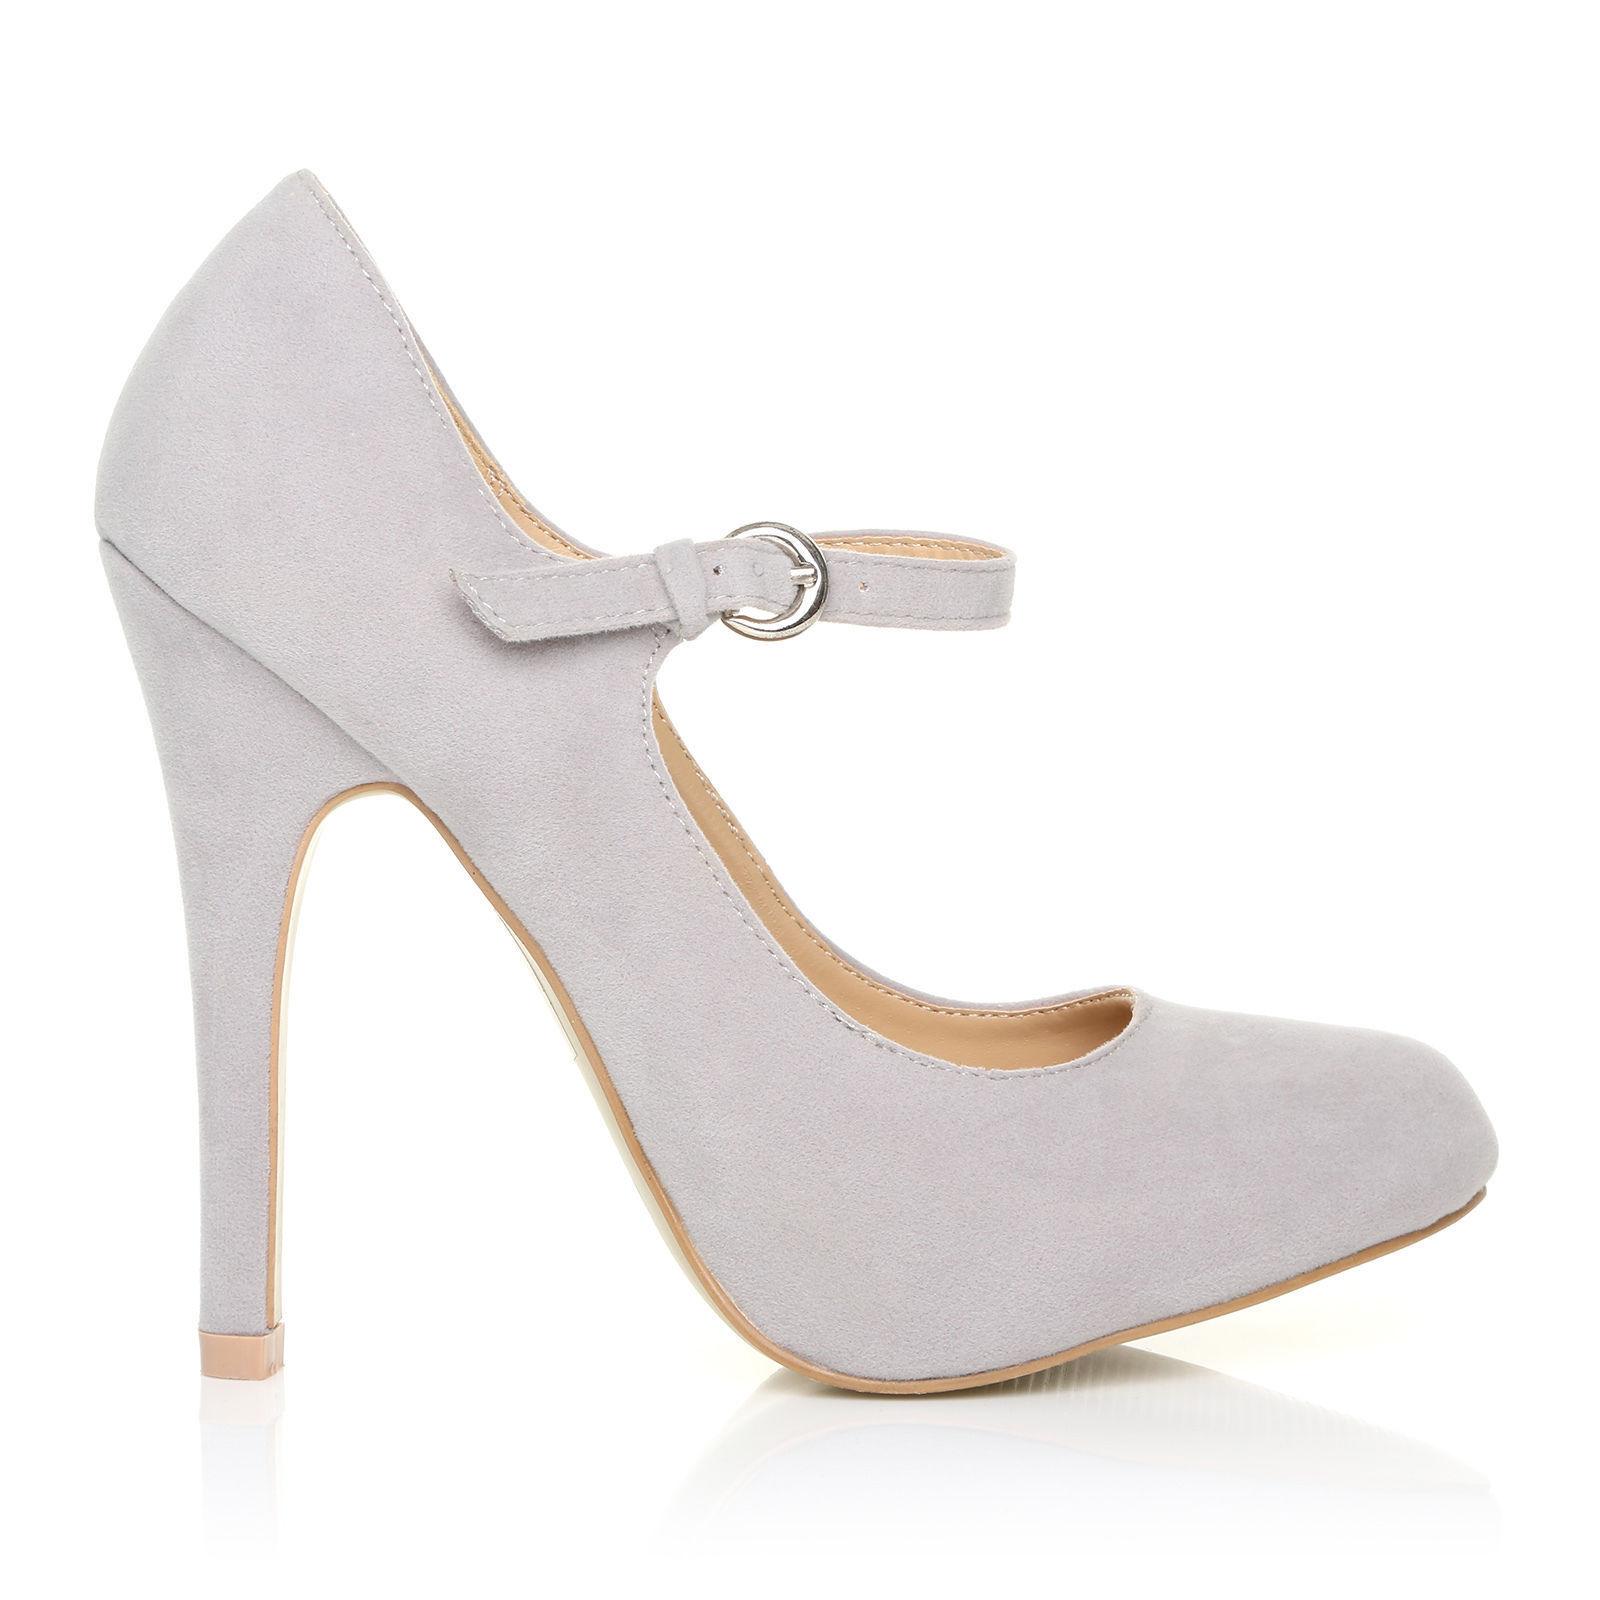 9d5901cc645 Womens Mary Jane Strap Court Shoe High Heel PUMPS Suede Patent Ladies Grey  Suede UK 4 EU 37 for sale online